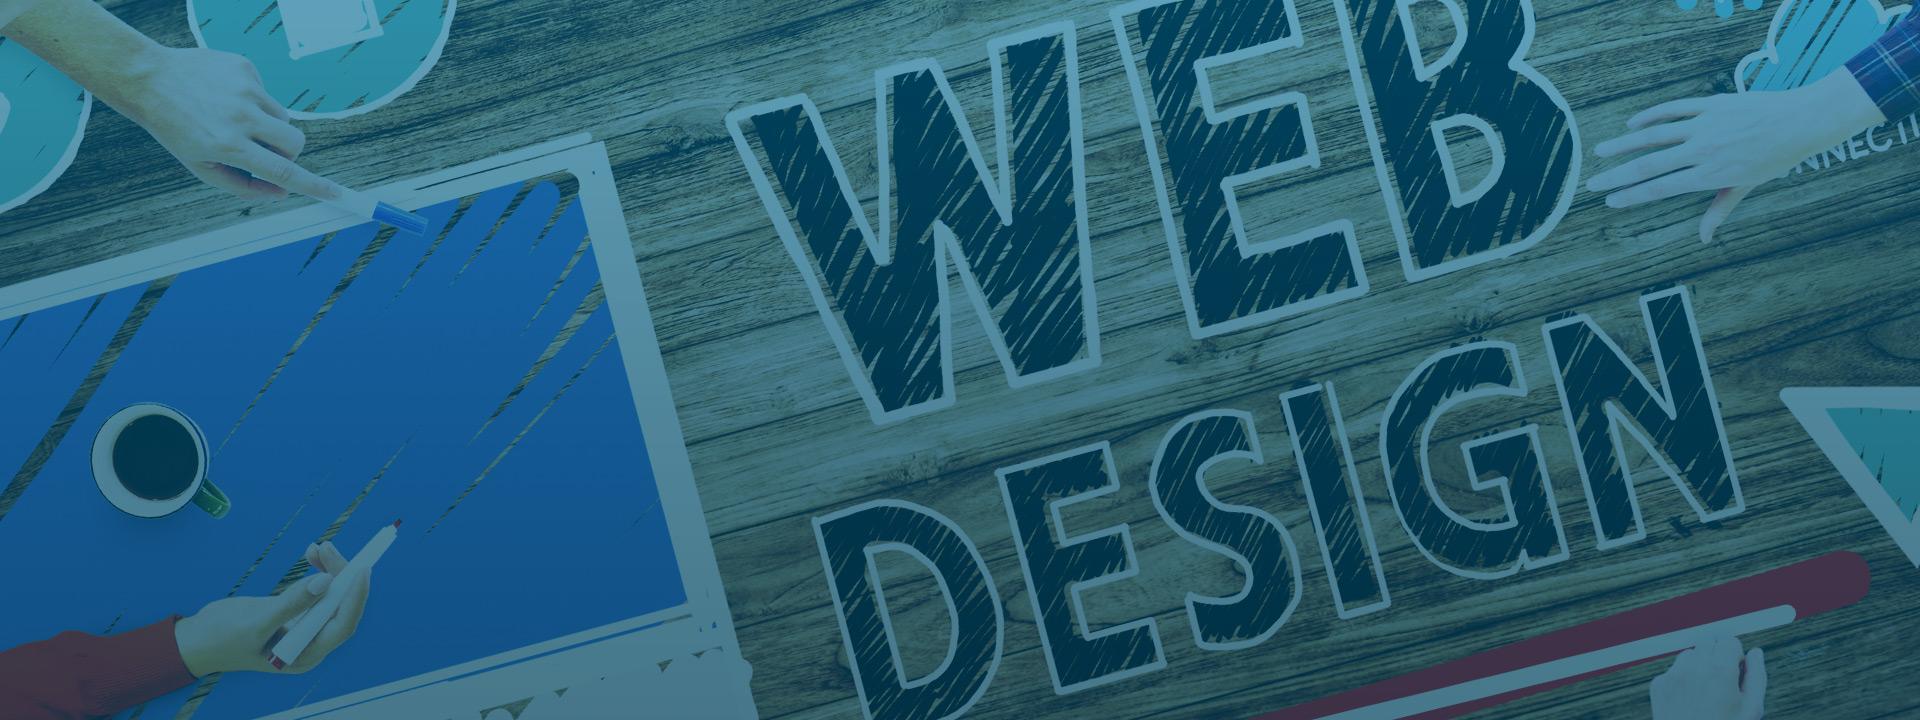 web-design-bg-03